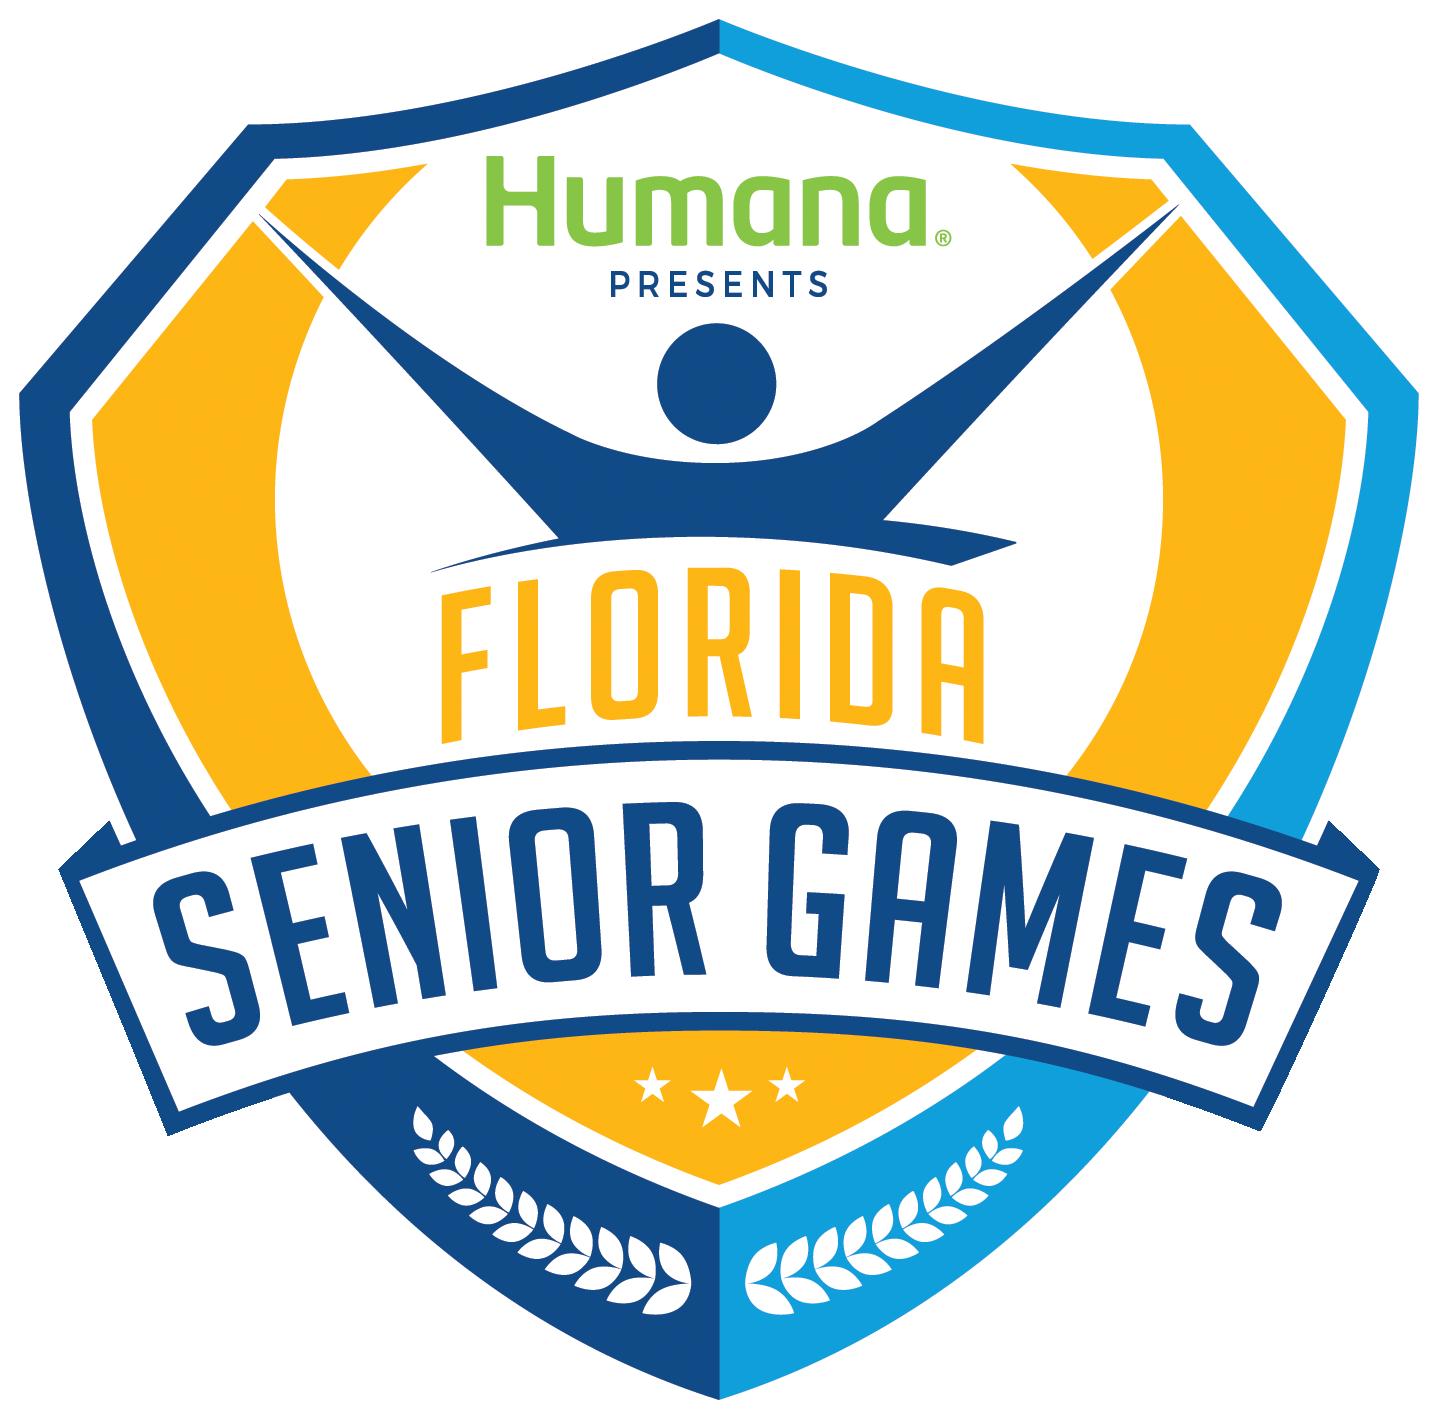 Florida Senior Games | Powerlifting | Local Senior Games